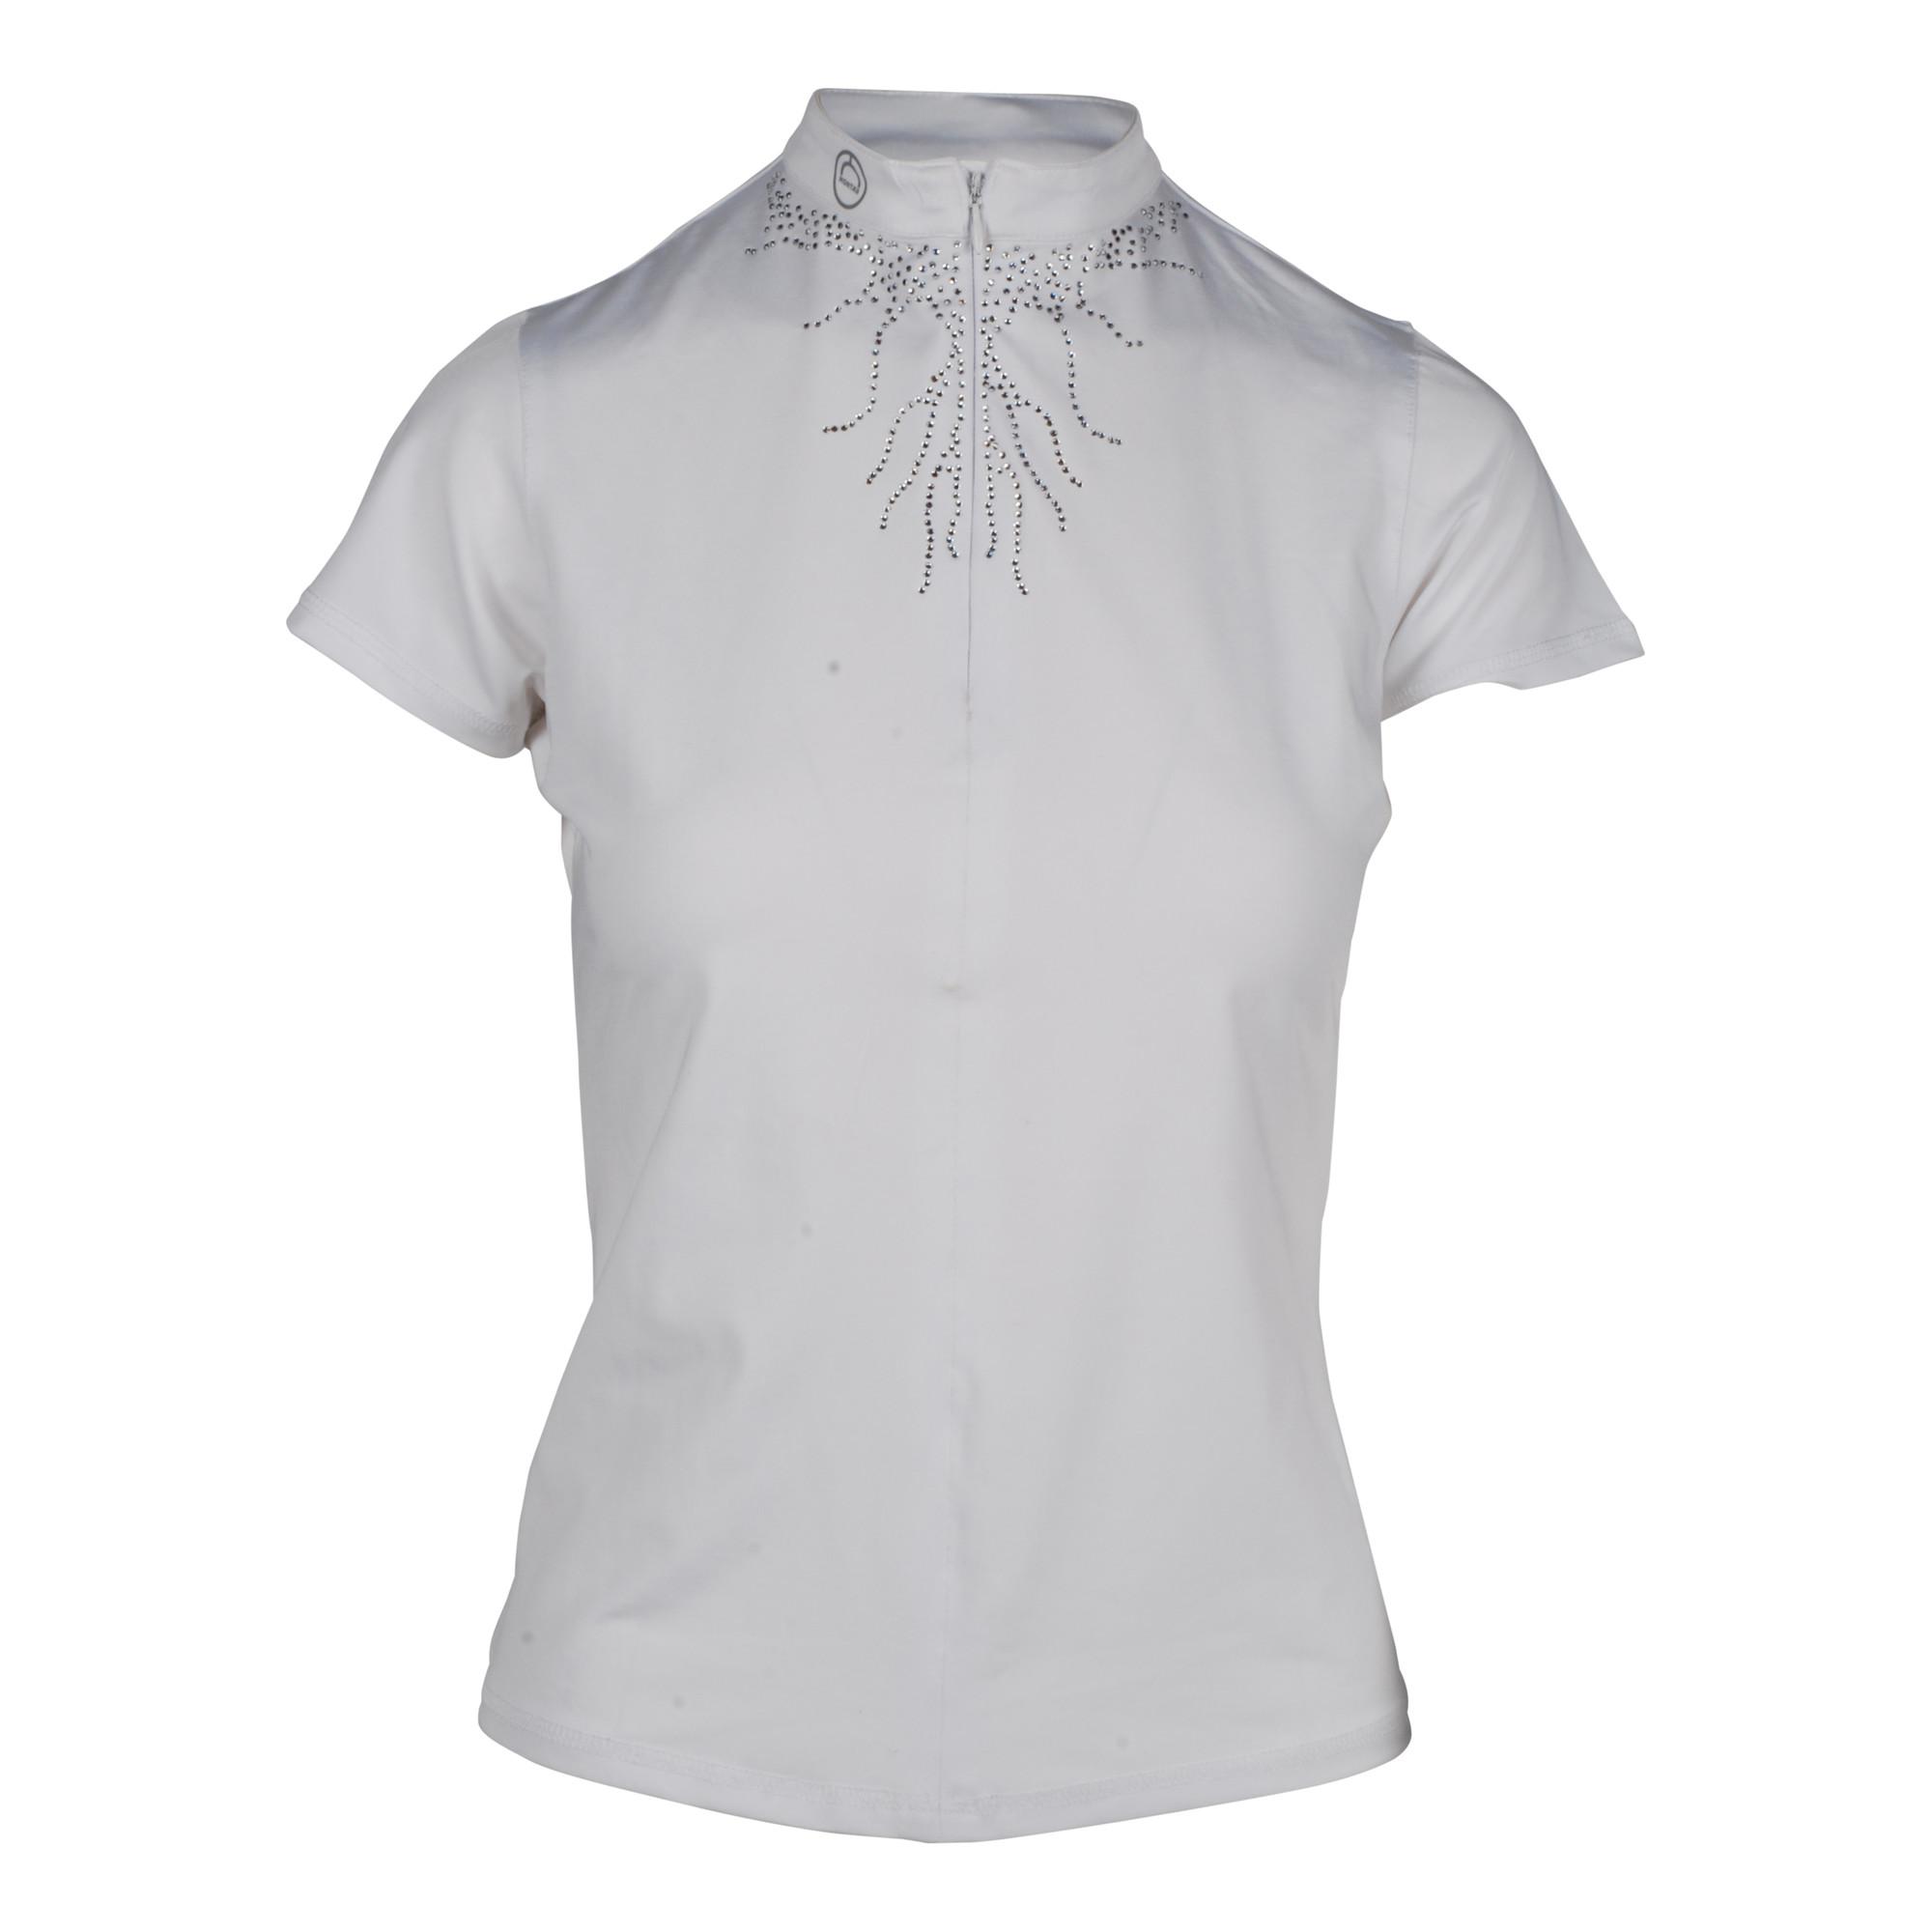 Montar Juliana wedstrijdshirt wit maat:xl